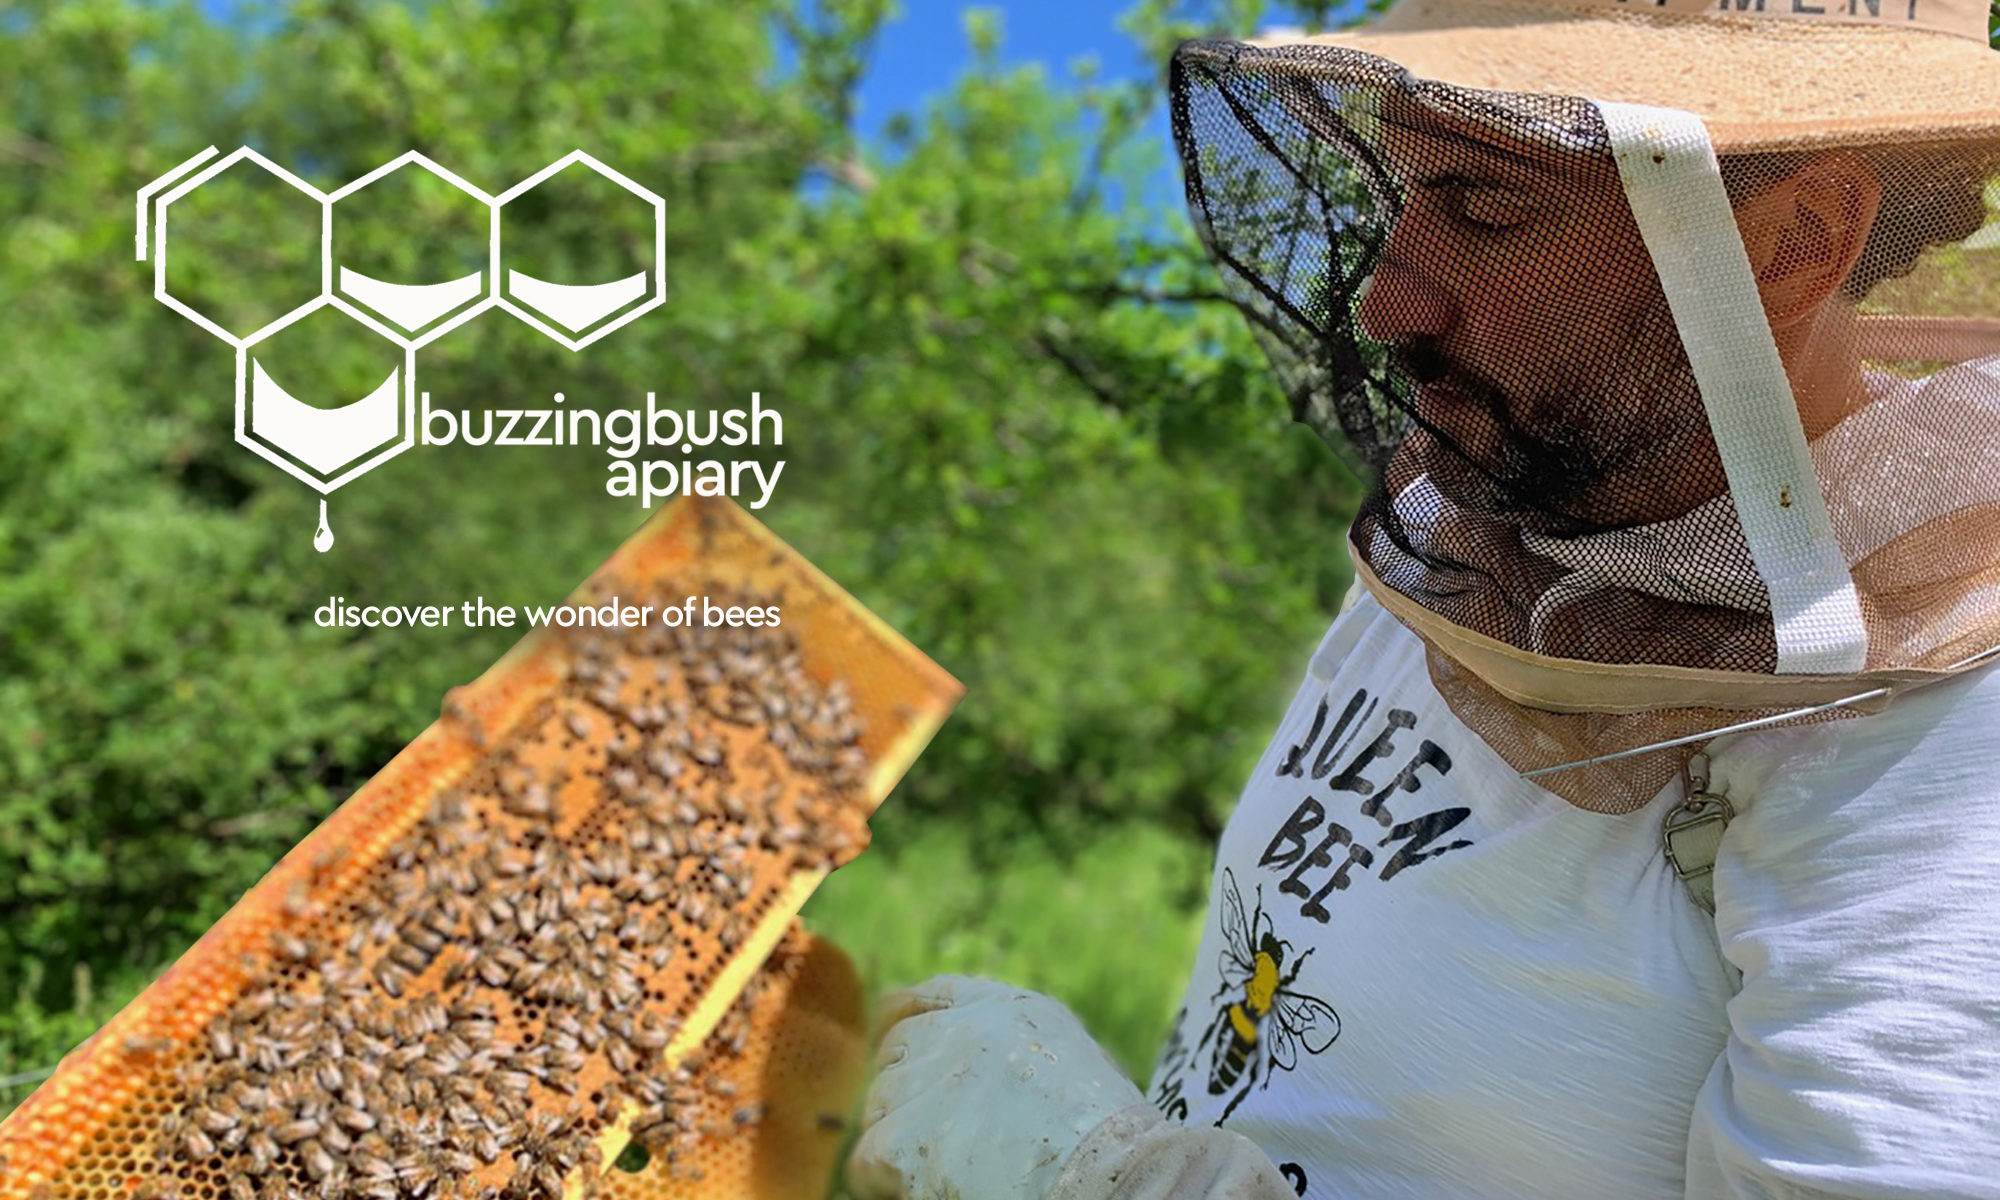 buzzing bush apiary